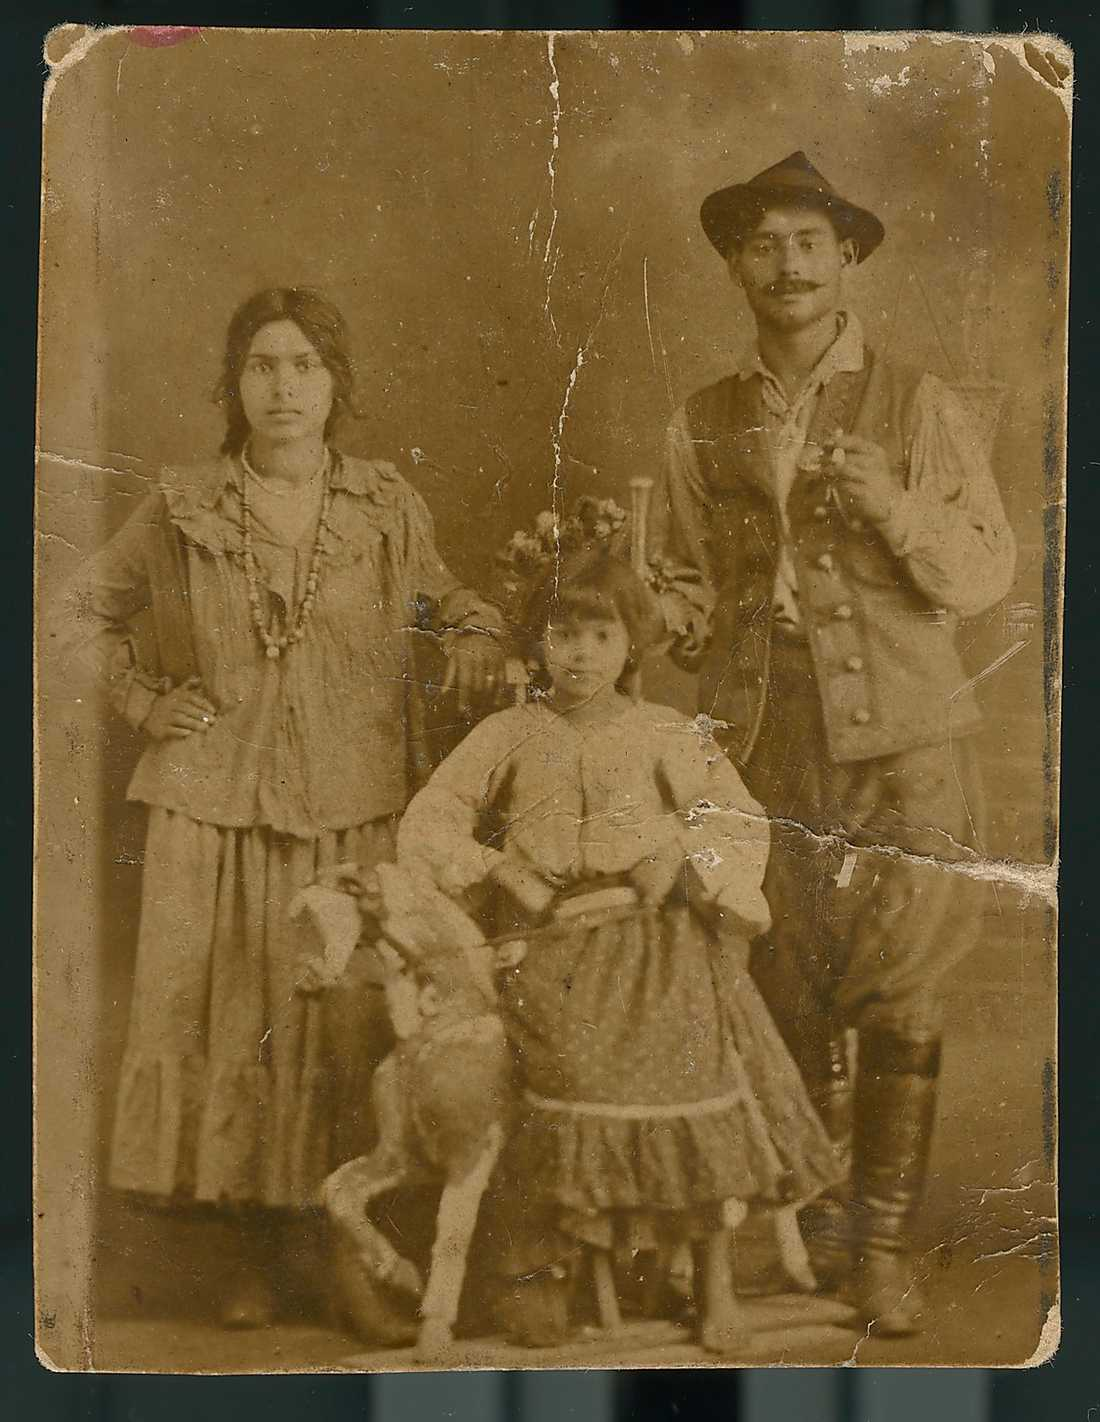 Jeanette Olssons gammelmormor och gammelmorfar med en av döttrarna i Mexiko 1917.